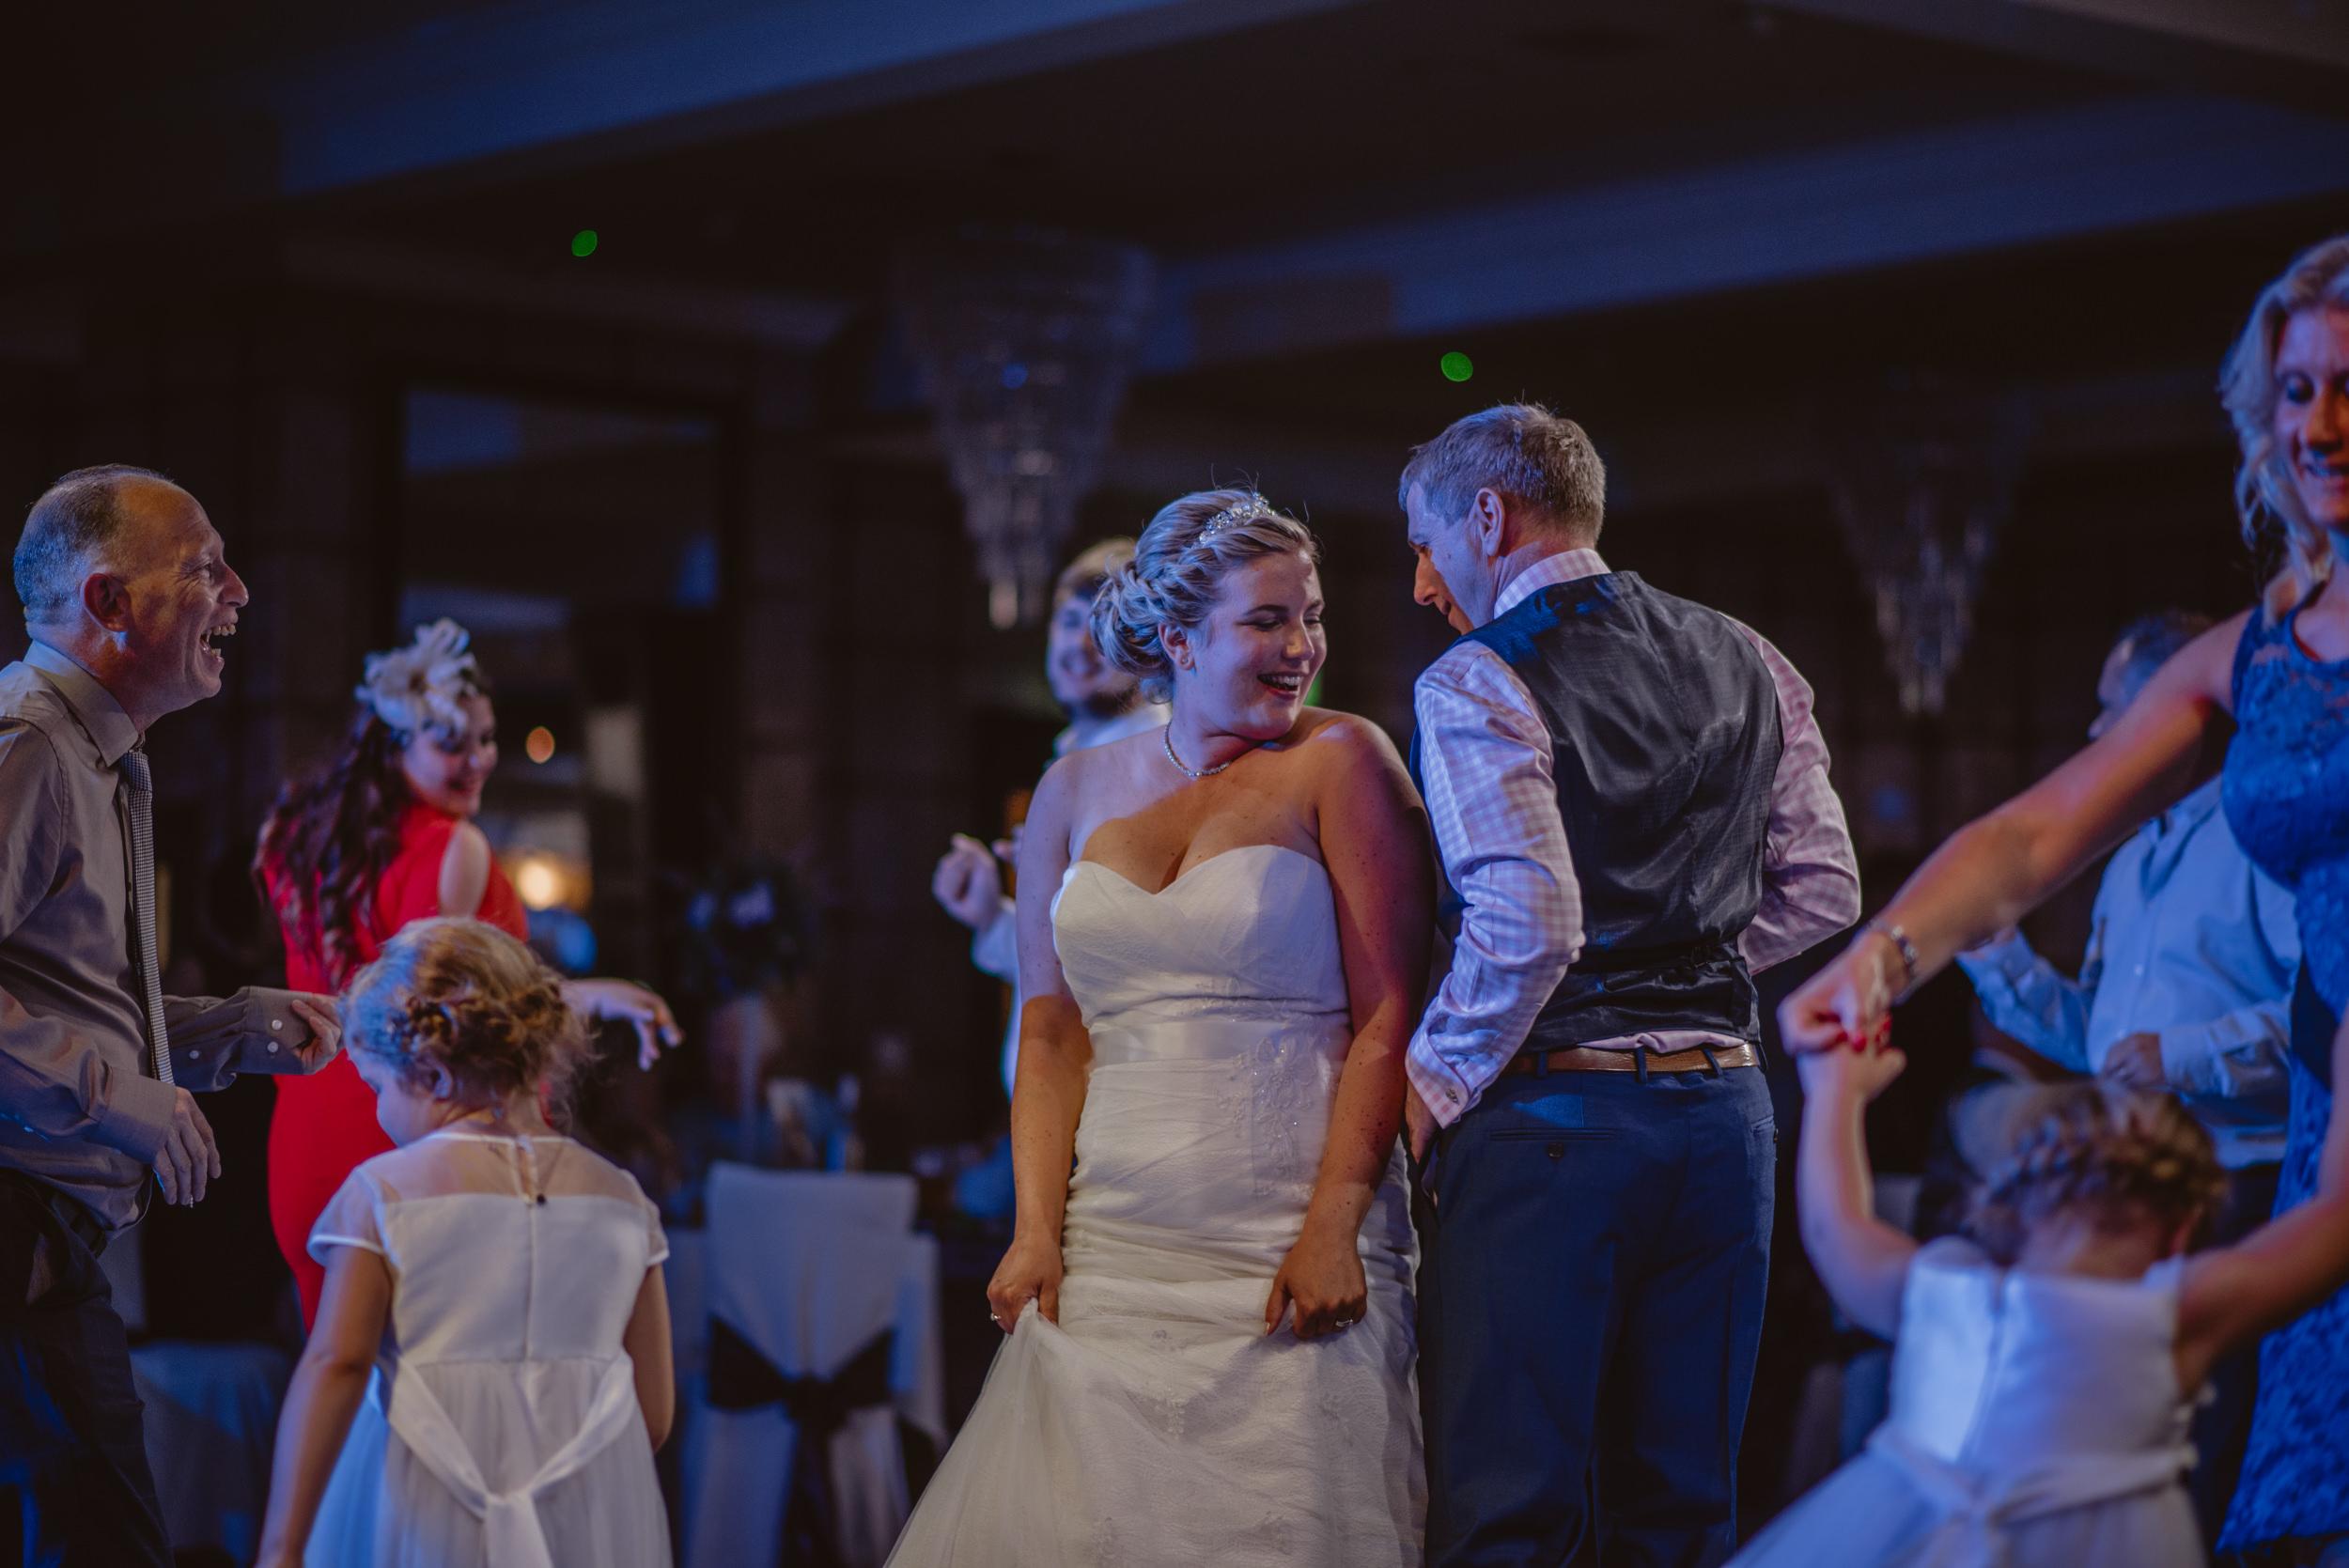 Chantelle-and-Stephen-Old-Thorns-Hotel-Wedding-Liphook-Manu-Mendoza-Wedding-Photography-586.jpg